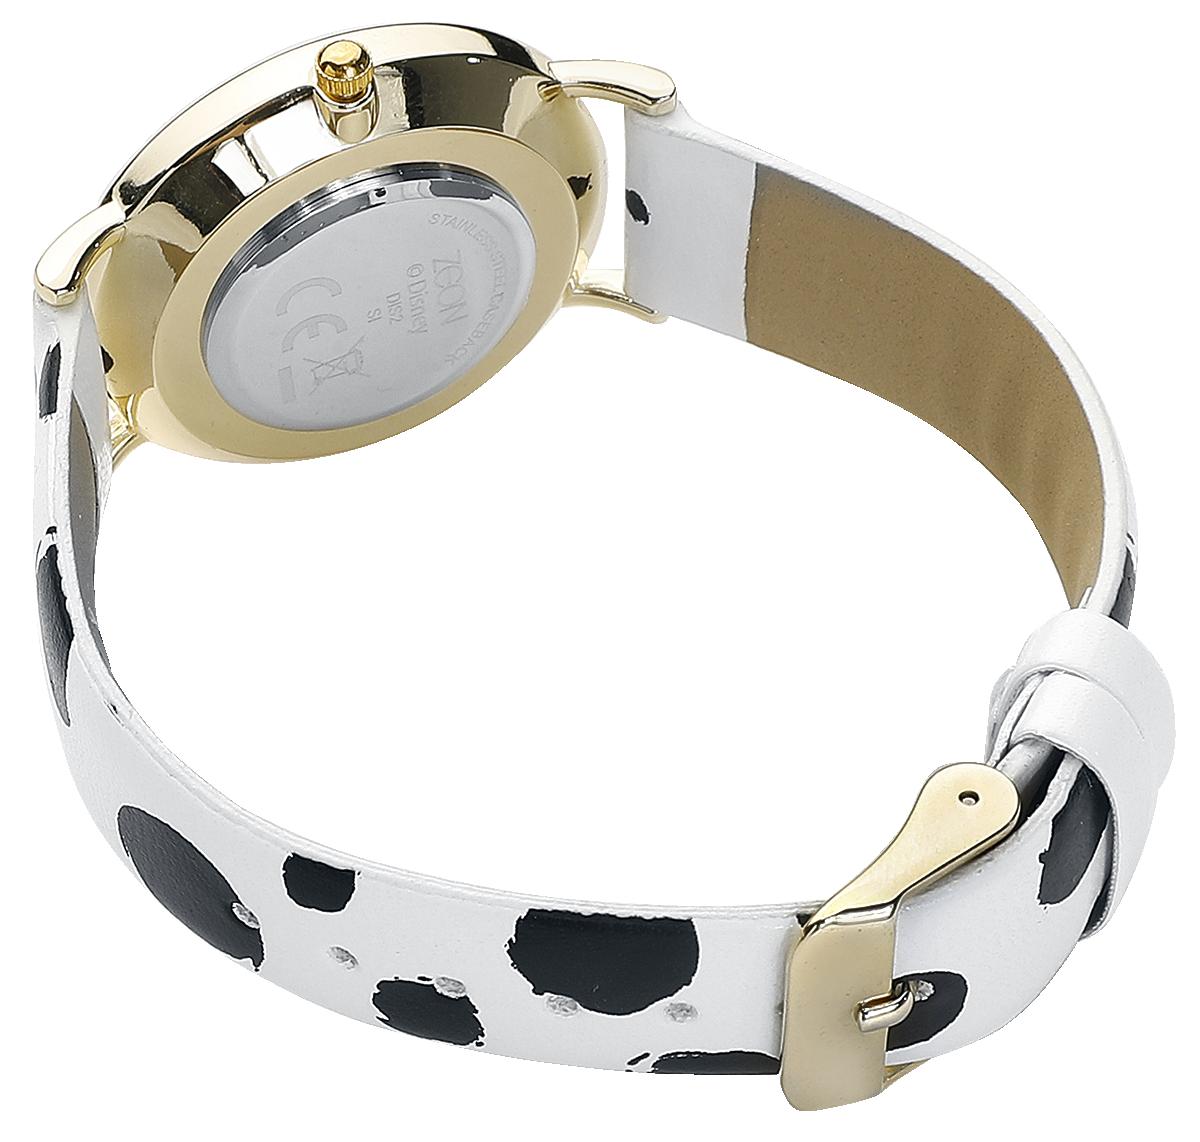 Image of 101 Dalmatiner 101 Dalmatiner Armbanduhr schwarz/weiß